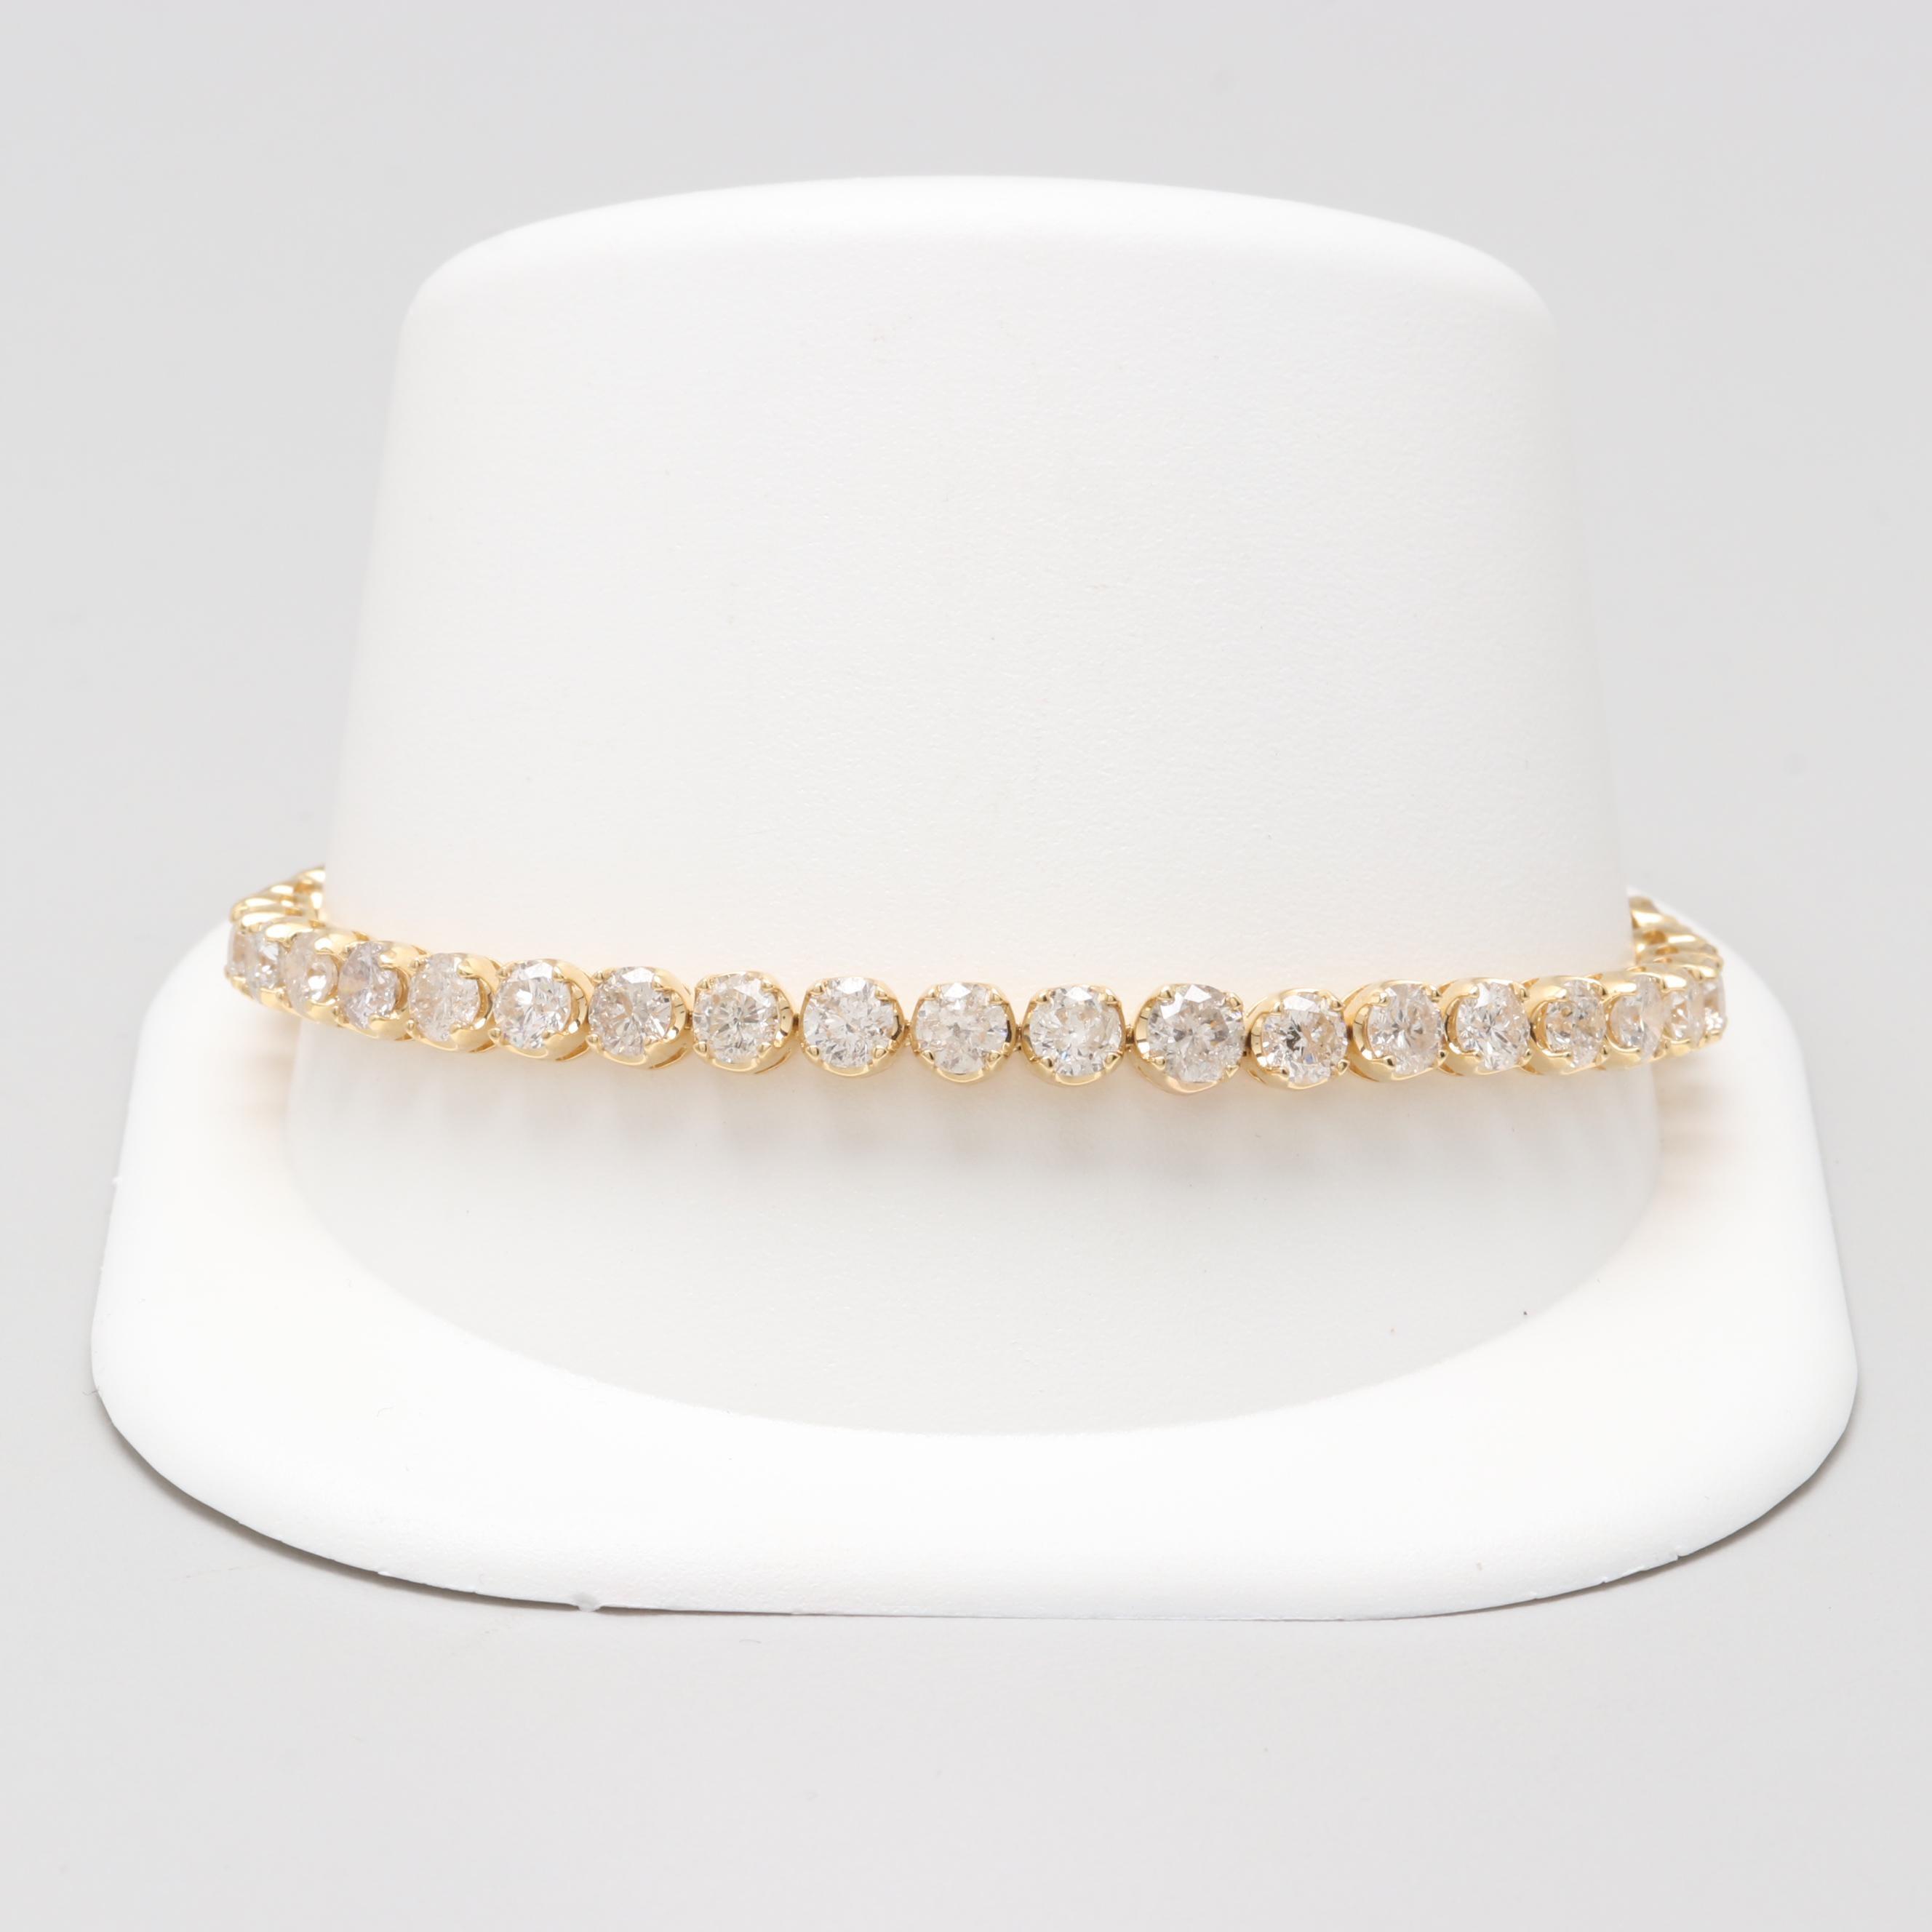 18K Yellow Gold 8.04 CTW Diamond Tennis Bracelet